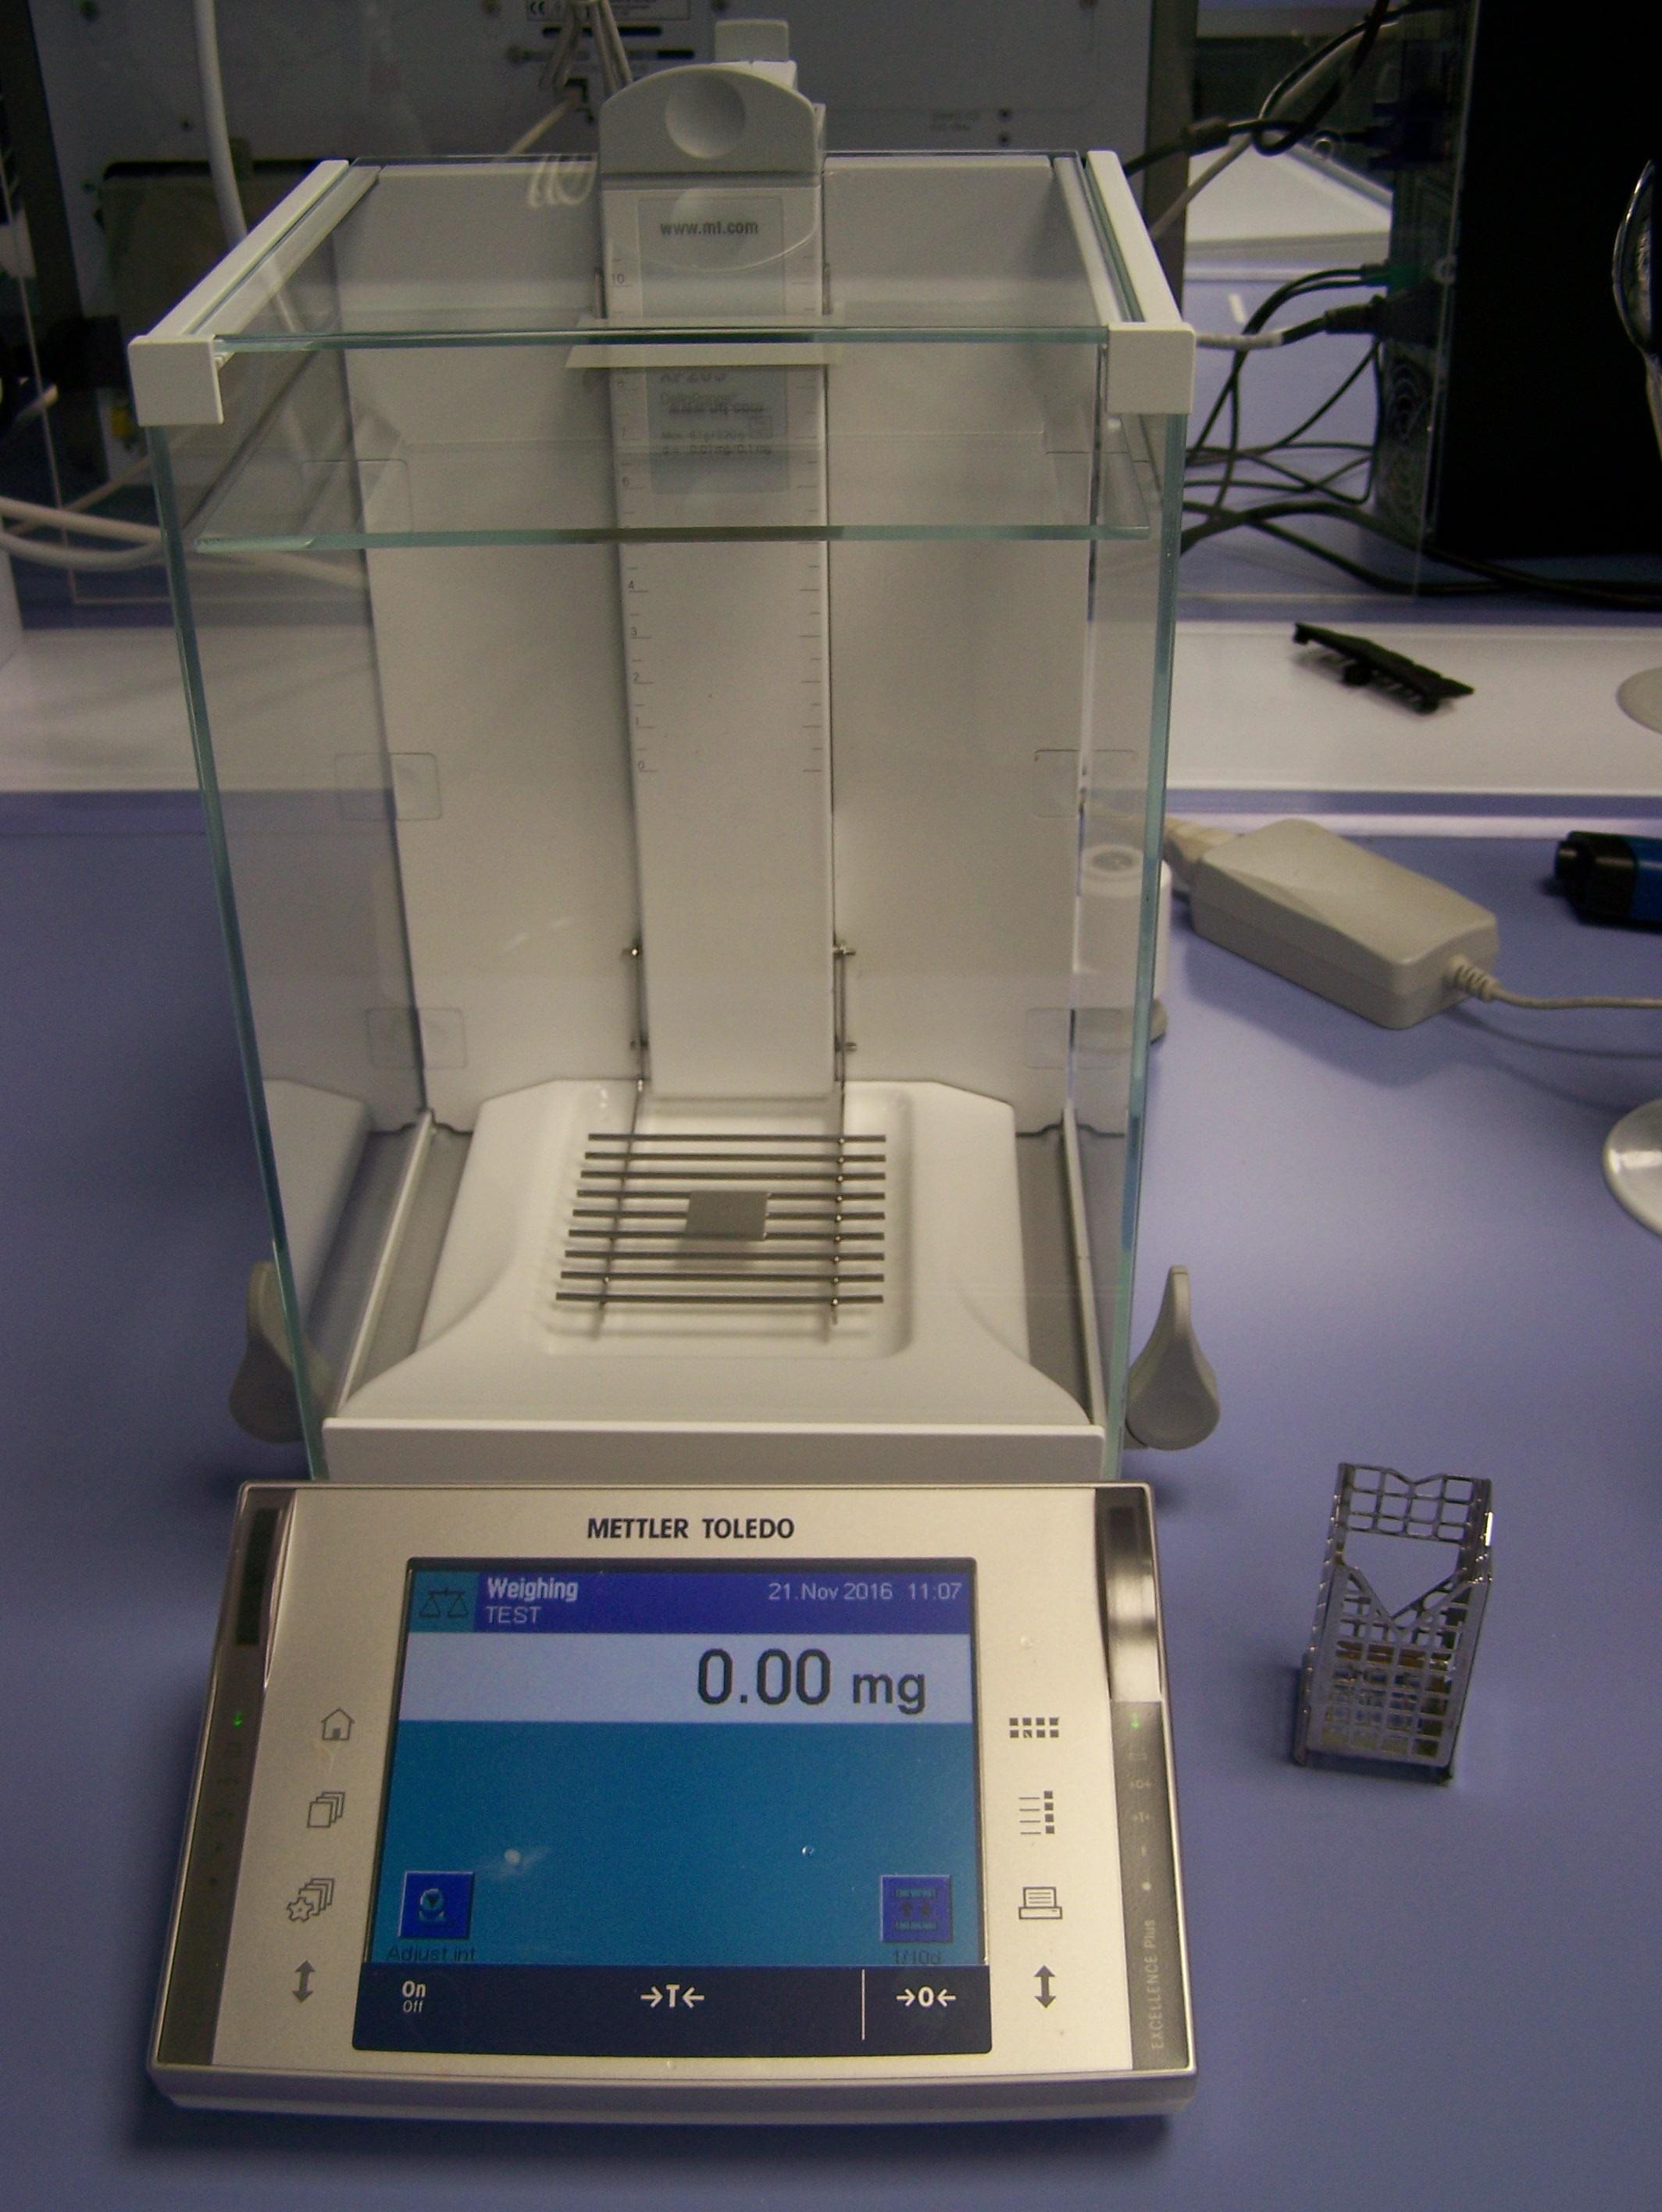 lab-cards/utilization-of-balances/img/XPE205DR.jpg